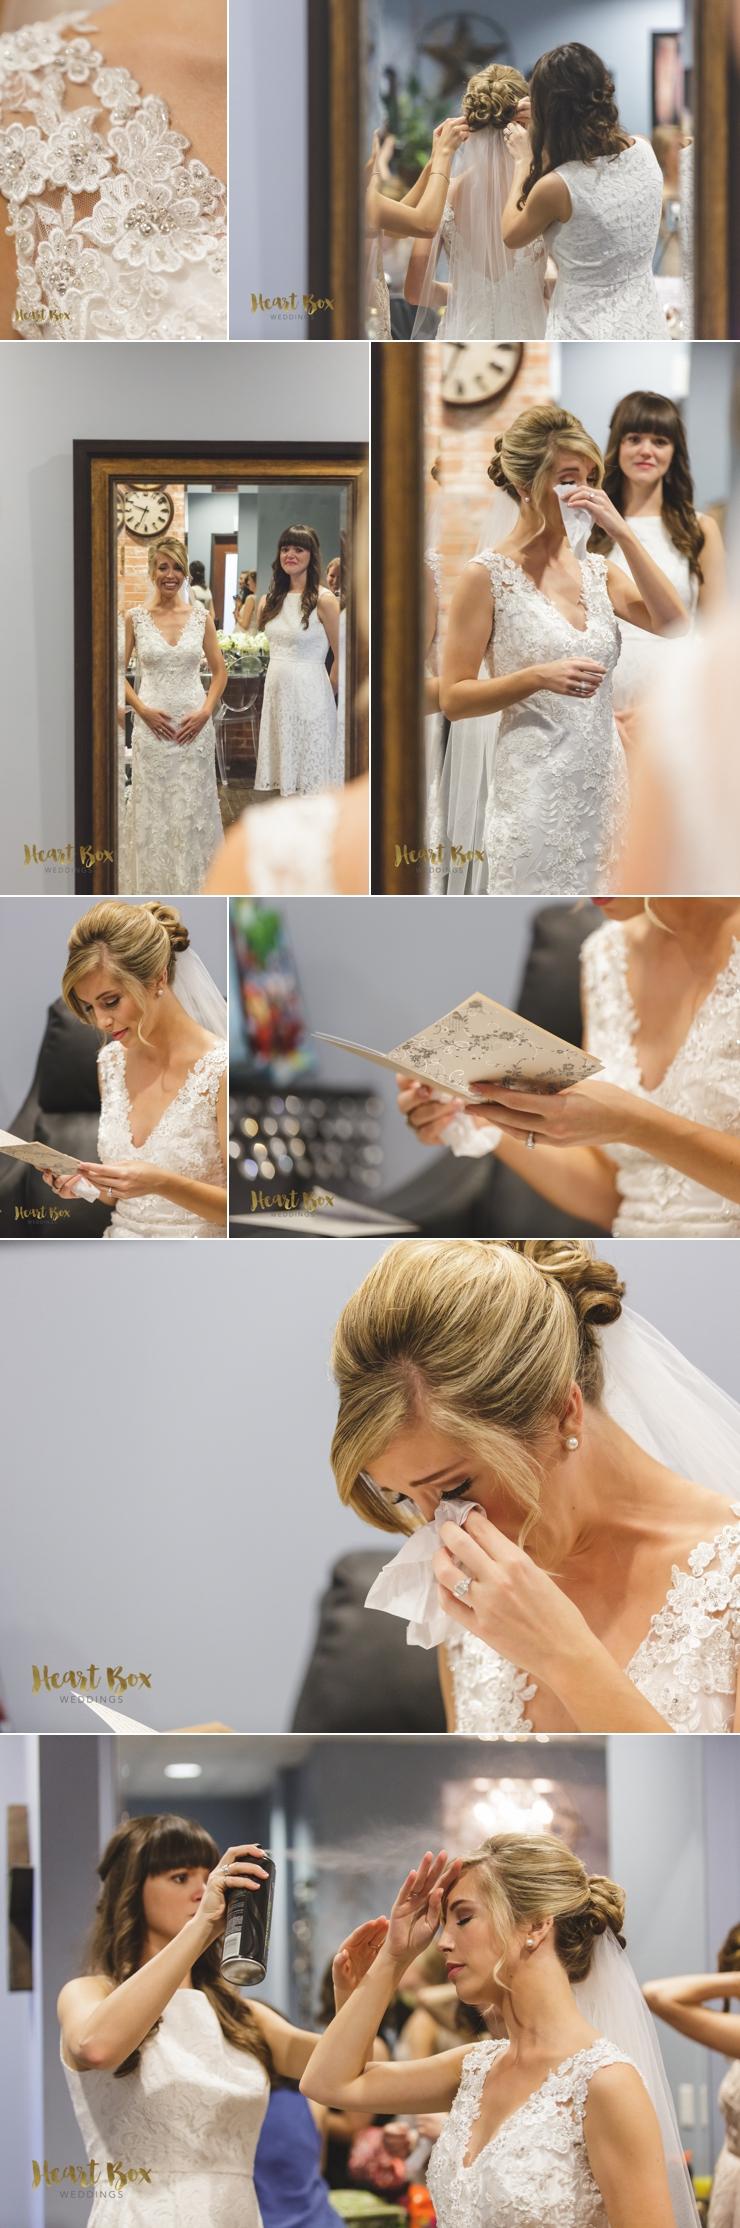 Popplewell Wedding Blog Collages 3.jpg